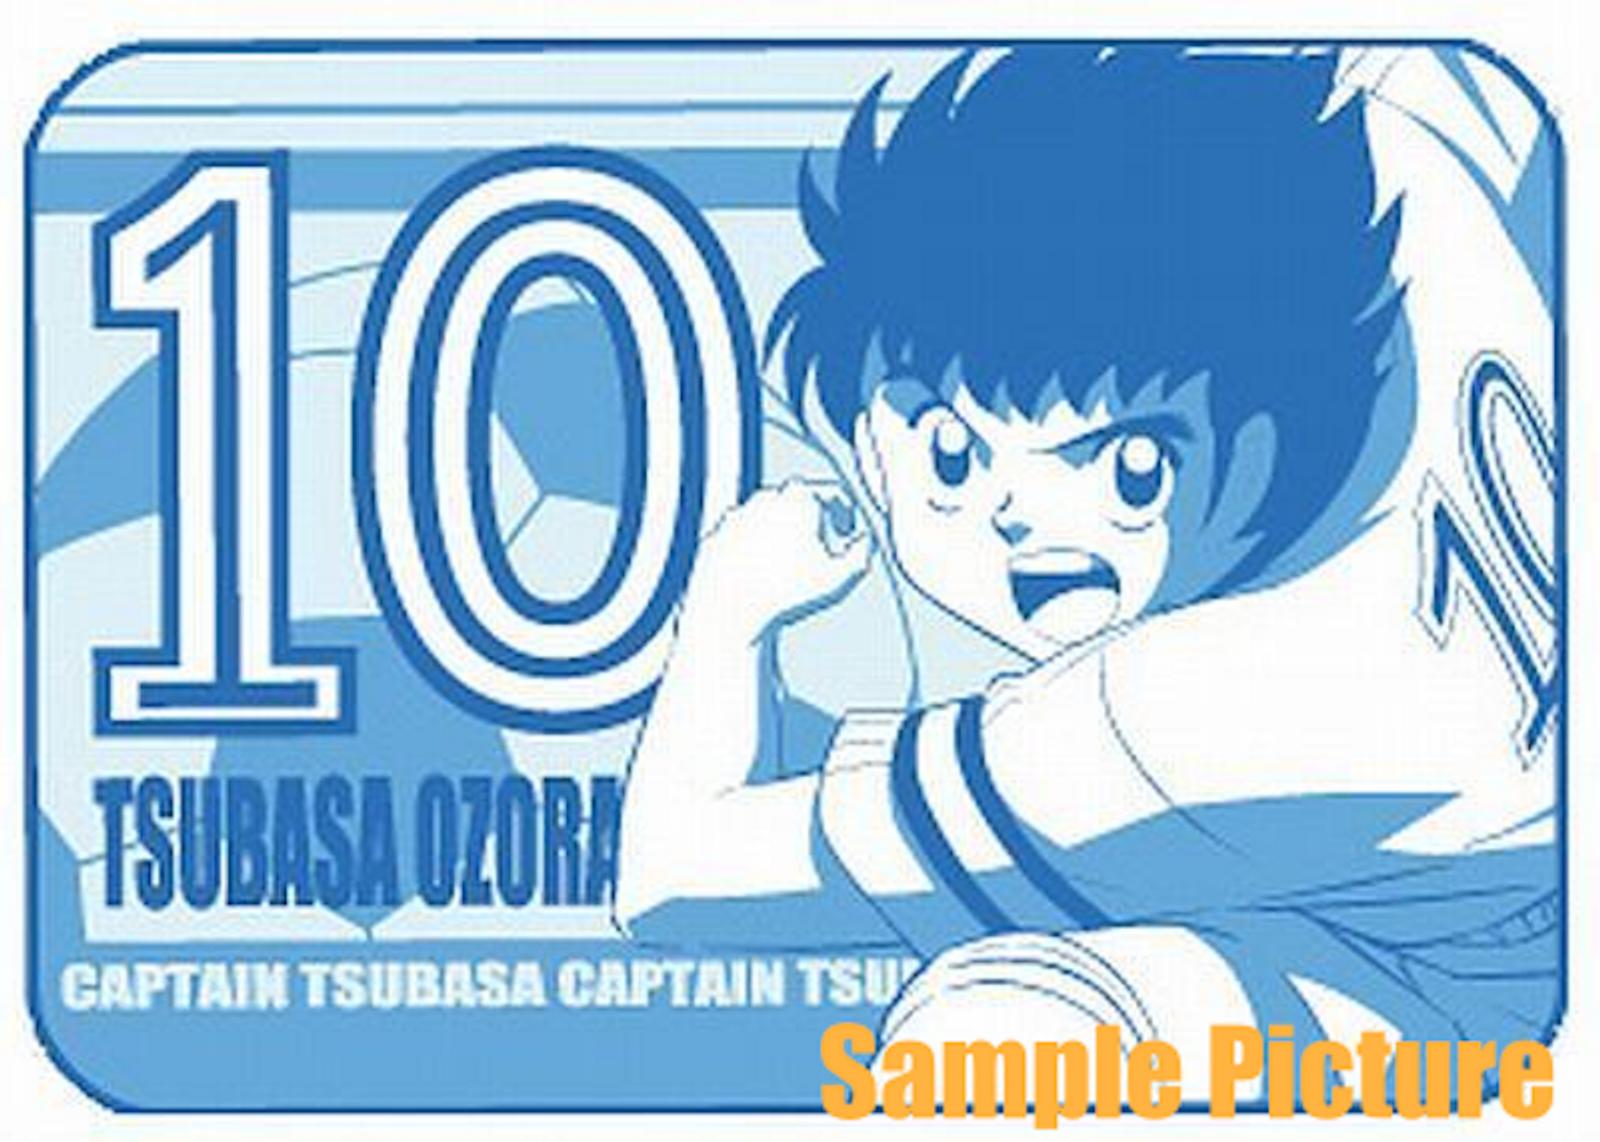 Captain Tsubasa Tsubasa Oozora Blanket 100x70cm (39x28inch) JAPAN ANIME MANGA